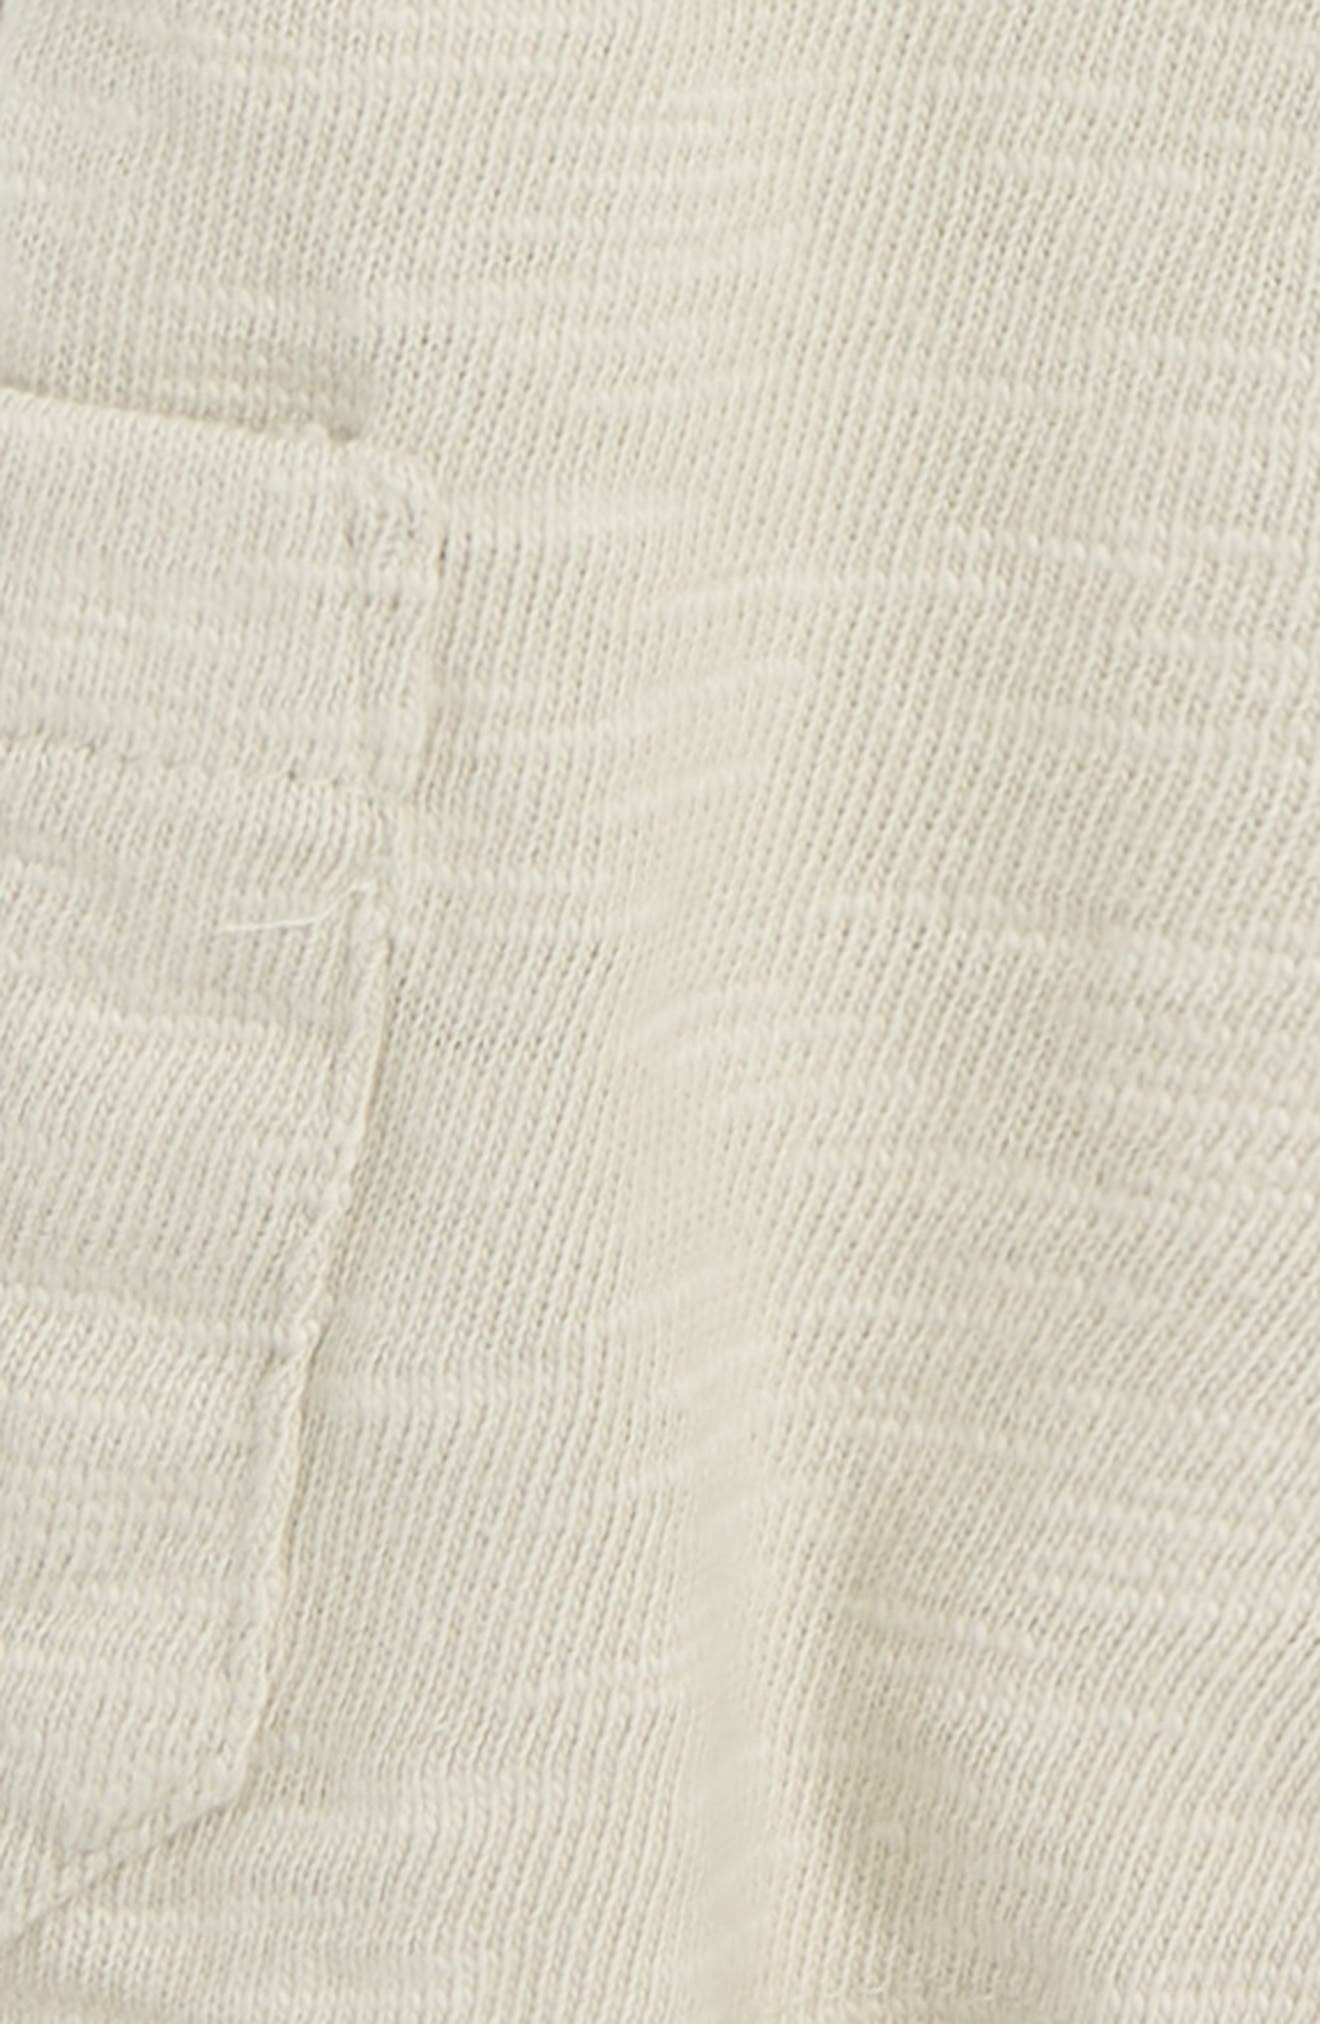 Asher Knit Cargo Shorts,                             Alternate thumbnail 2, color,                             Grey